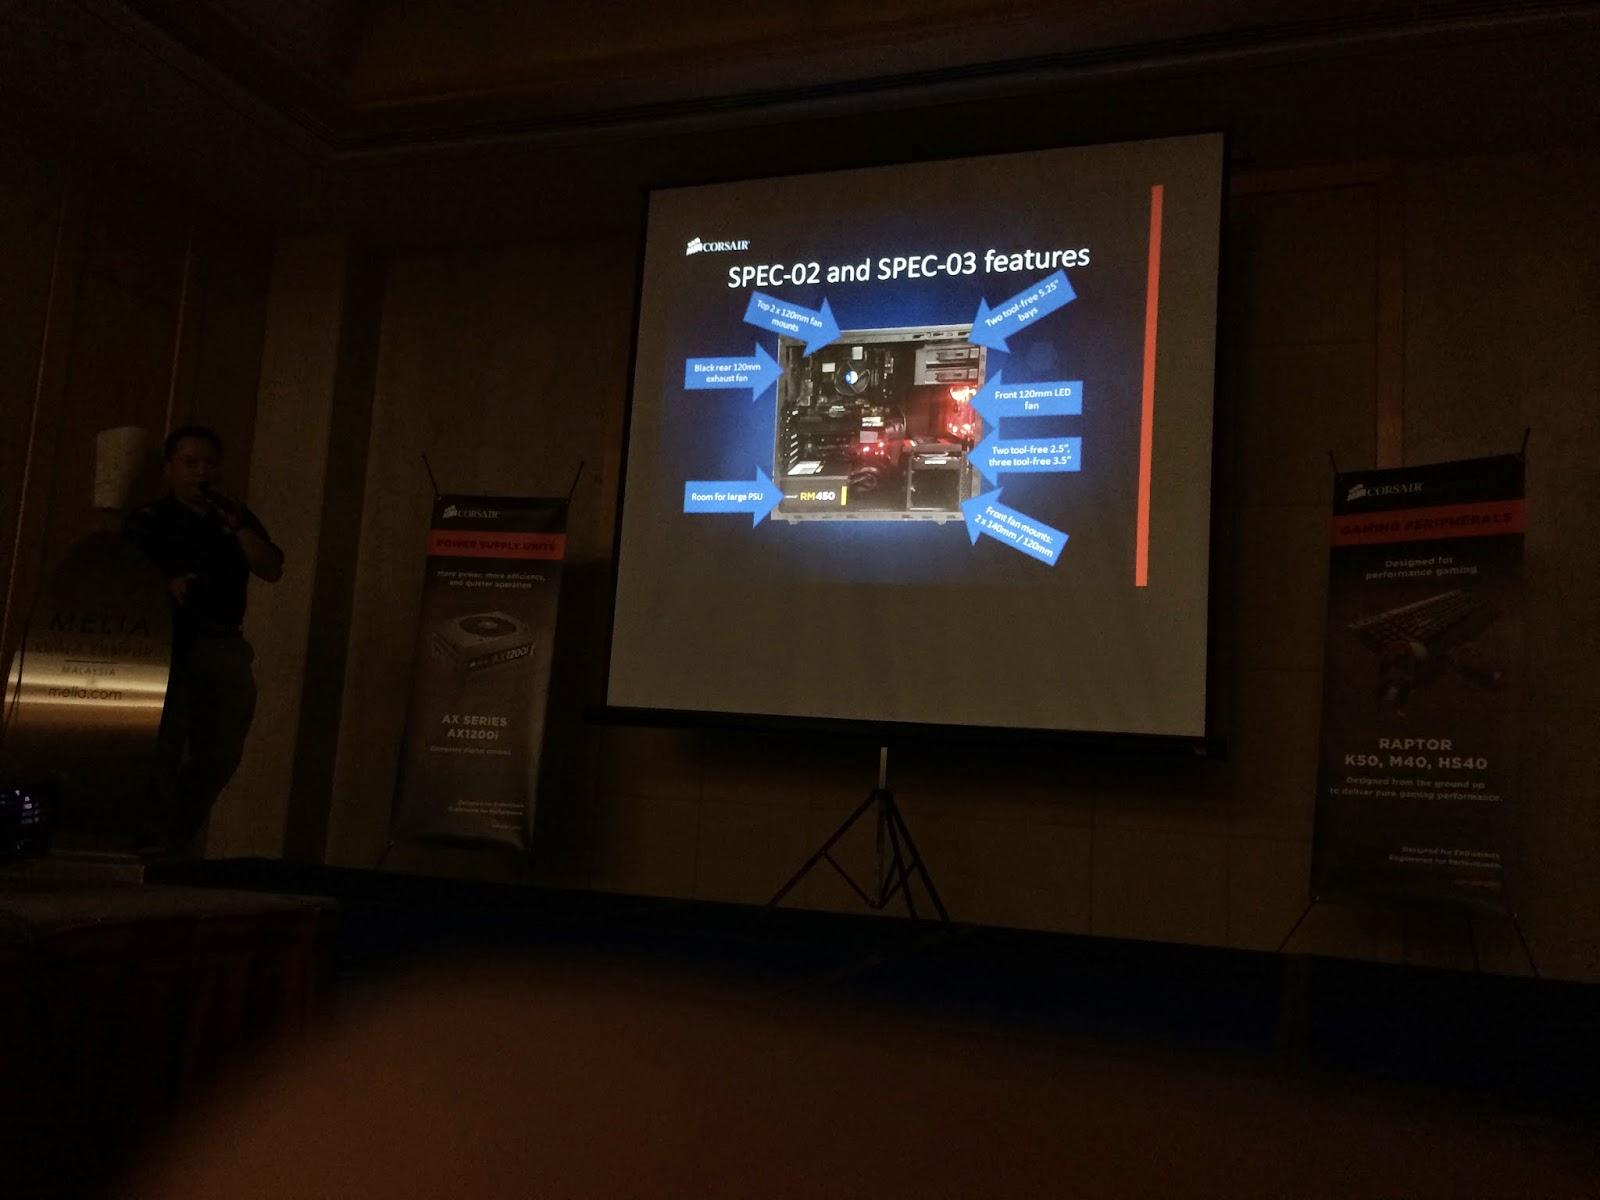 Coverage of Corsair Event @Melia Kuala Lumpur 26